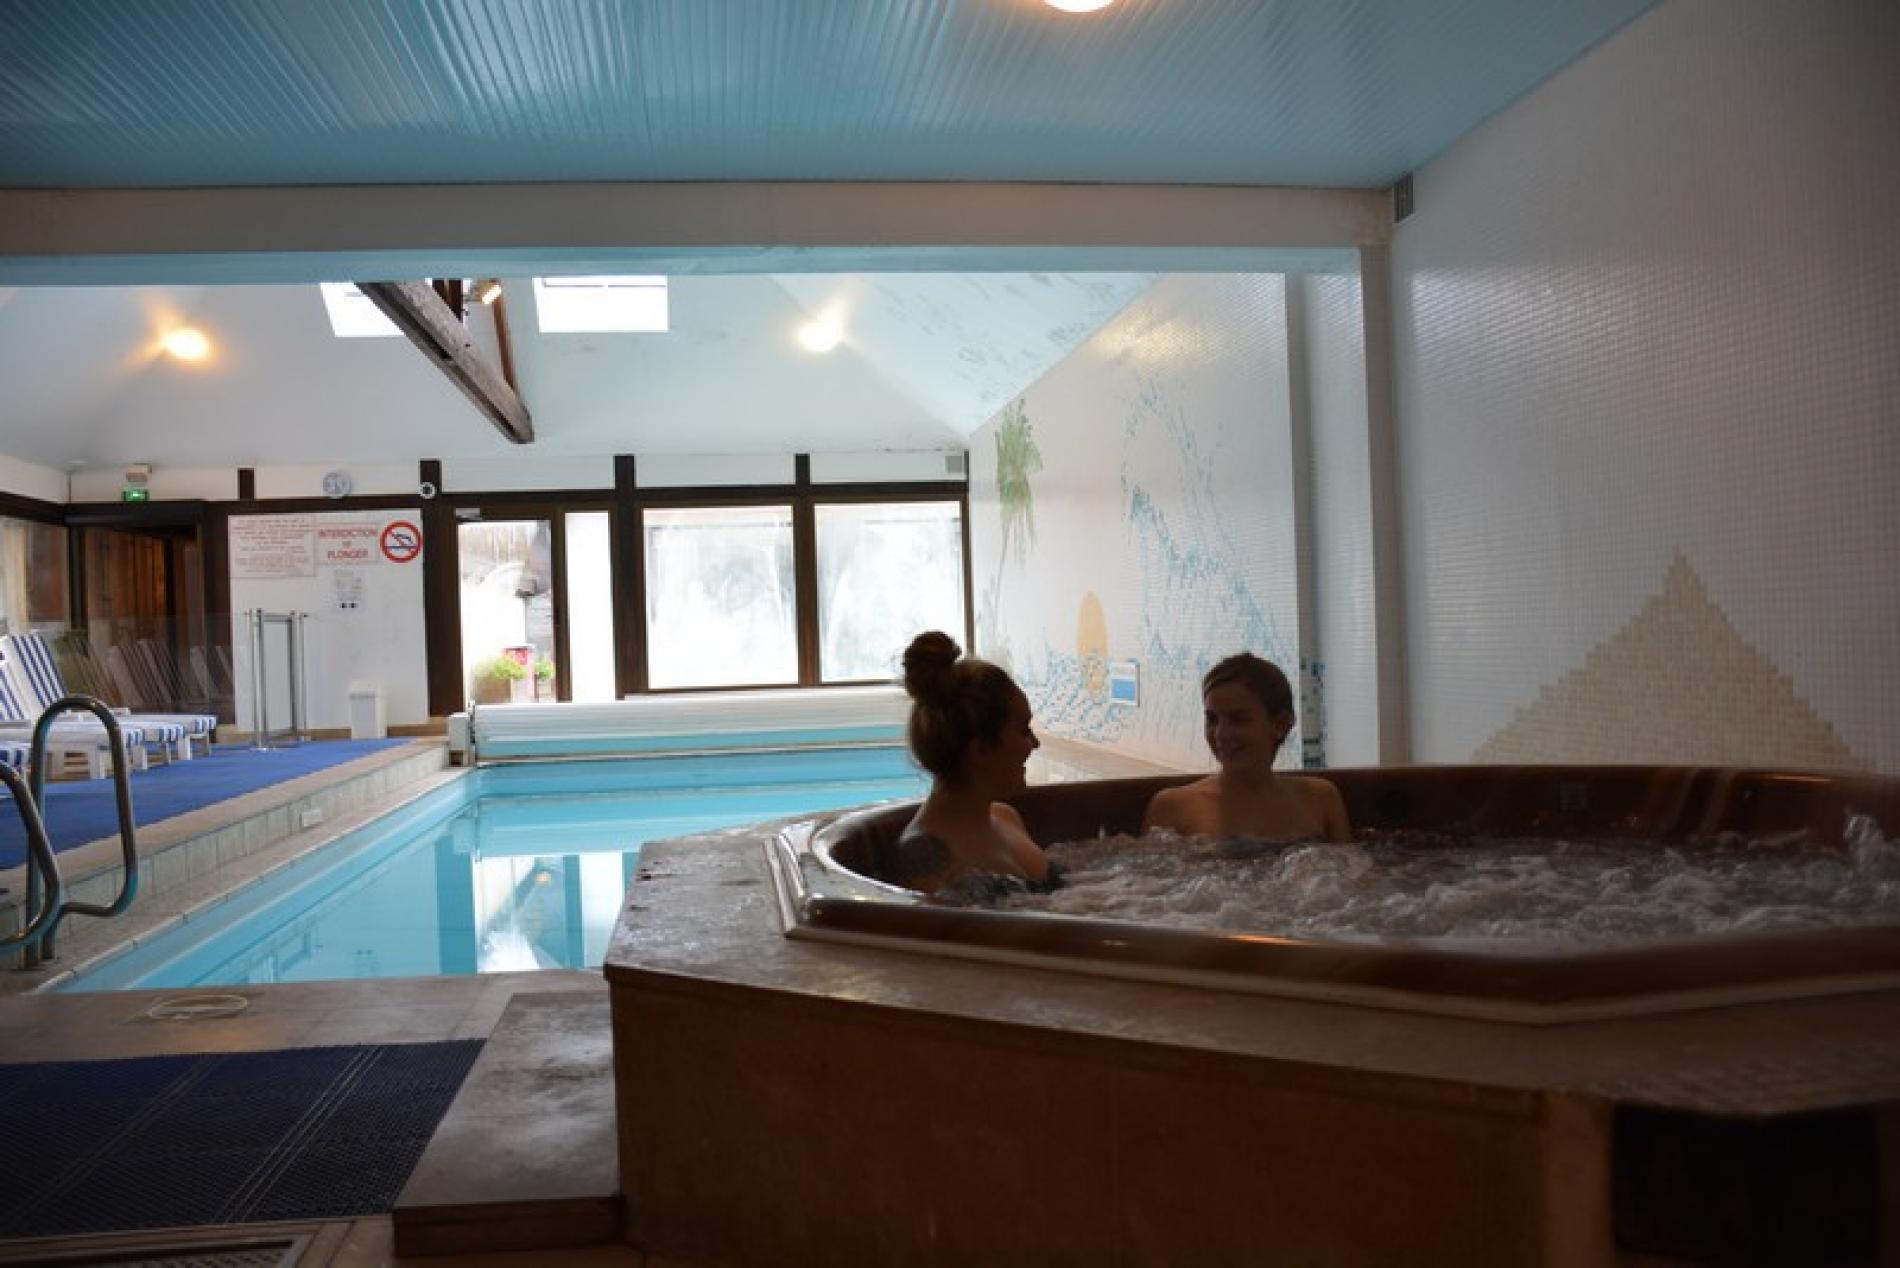 ∞ Hotel Deauville Avec Piscine - Hotel 3 Étoiles Deauville ... tout Horaires Piscine Deauville